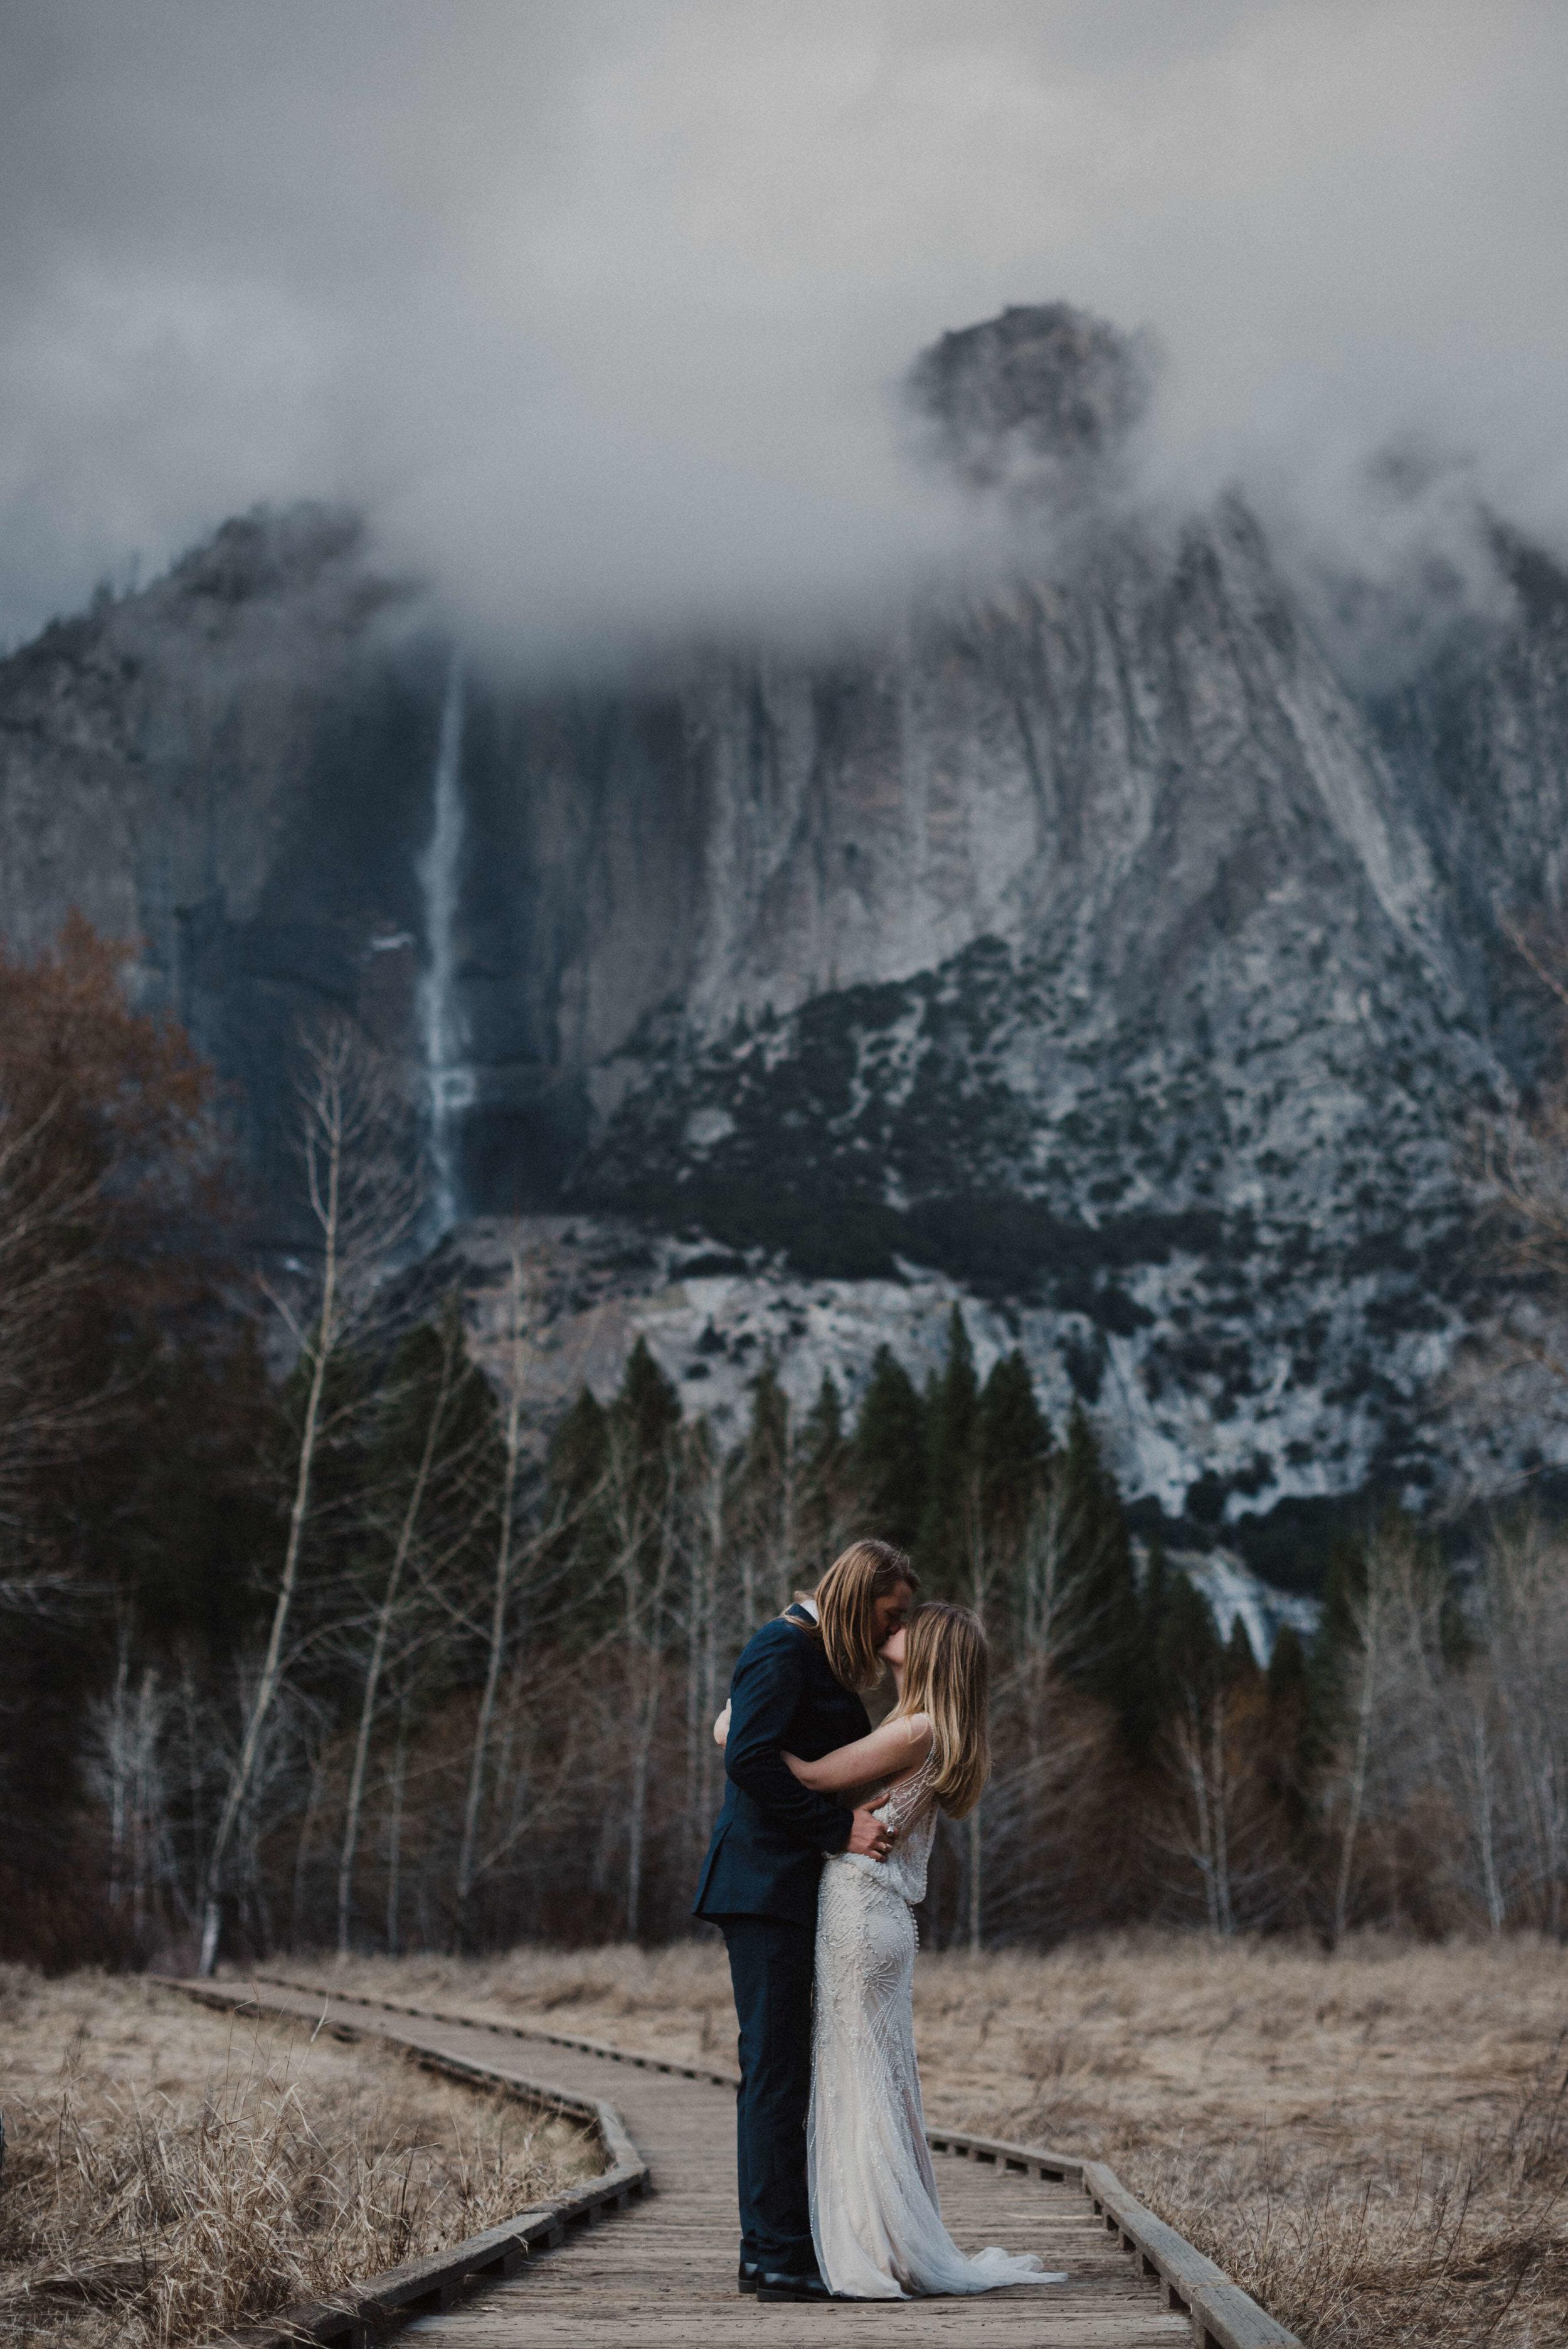 Adventure-Elopement-Yosemite-Valley-26.jpg